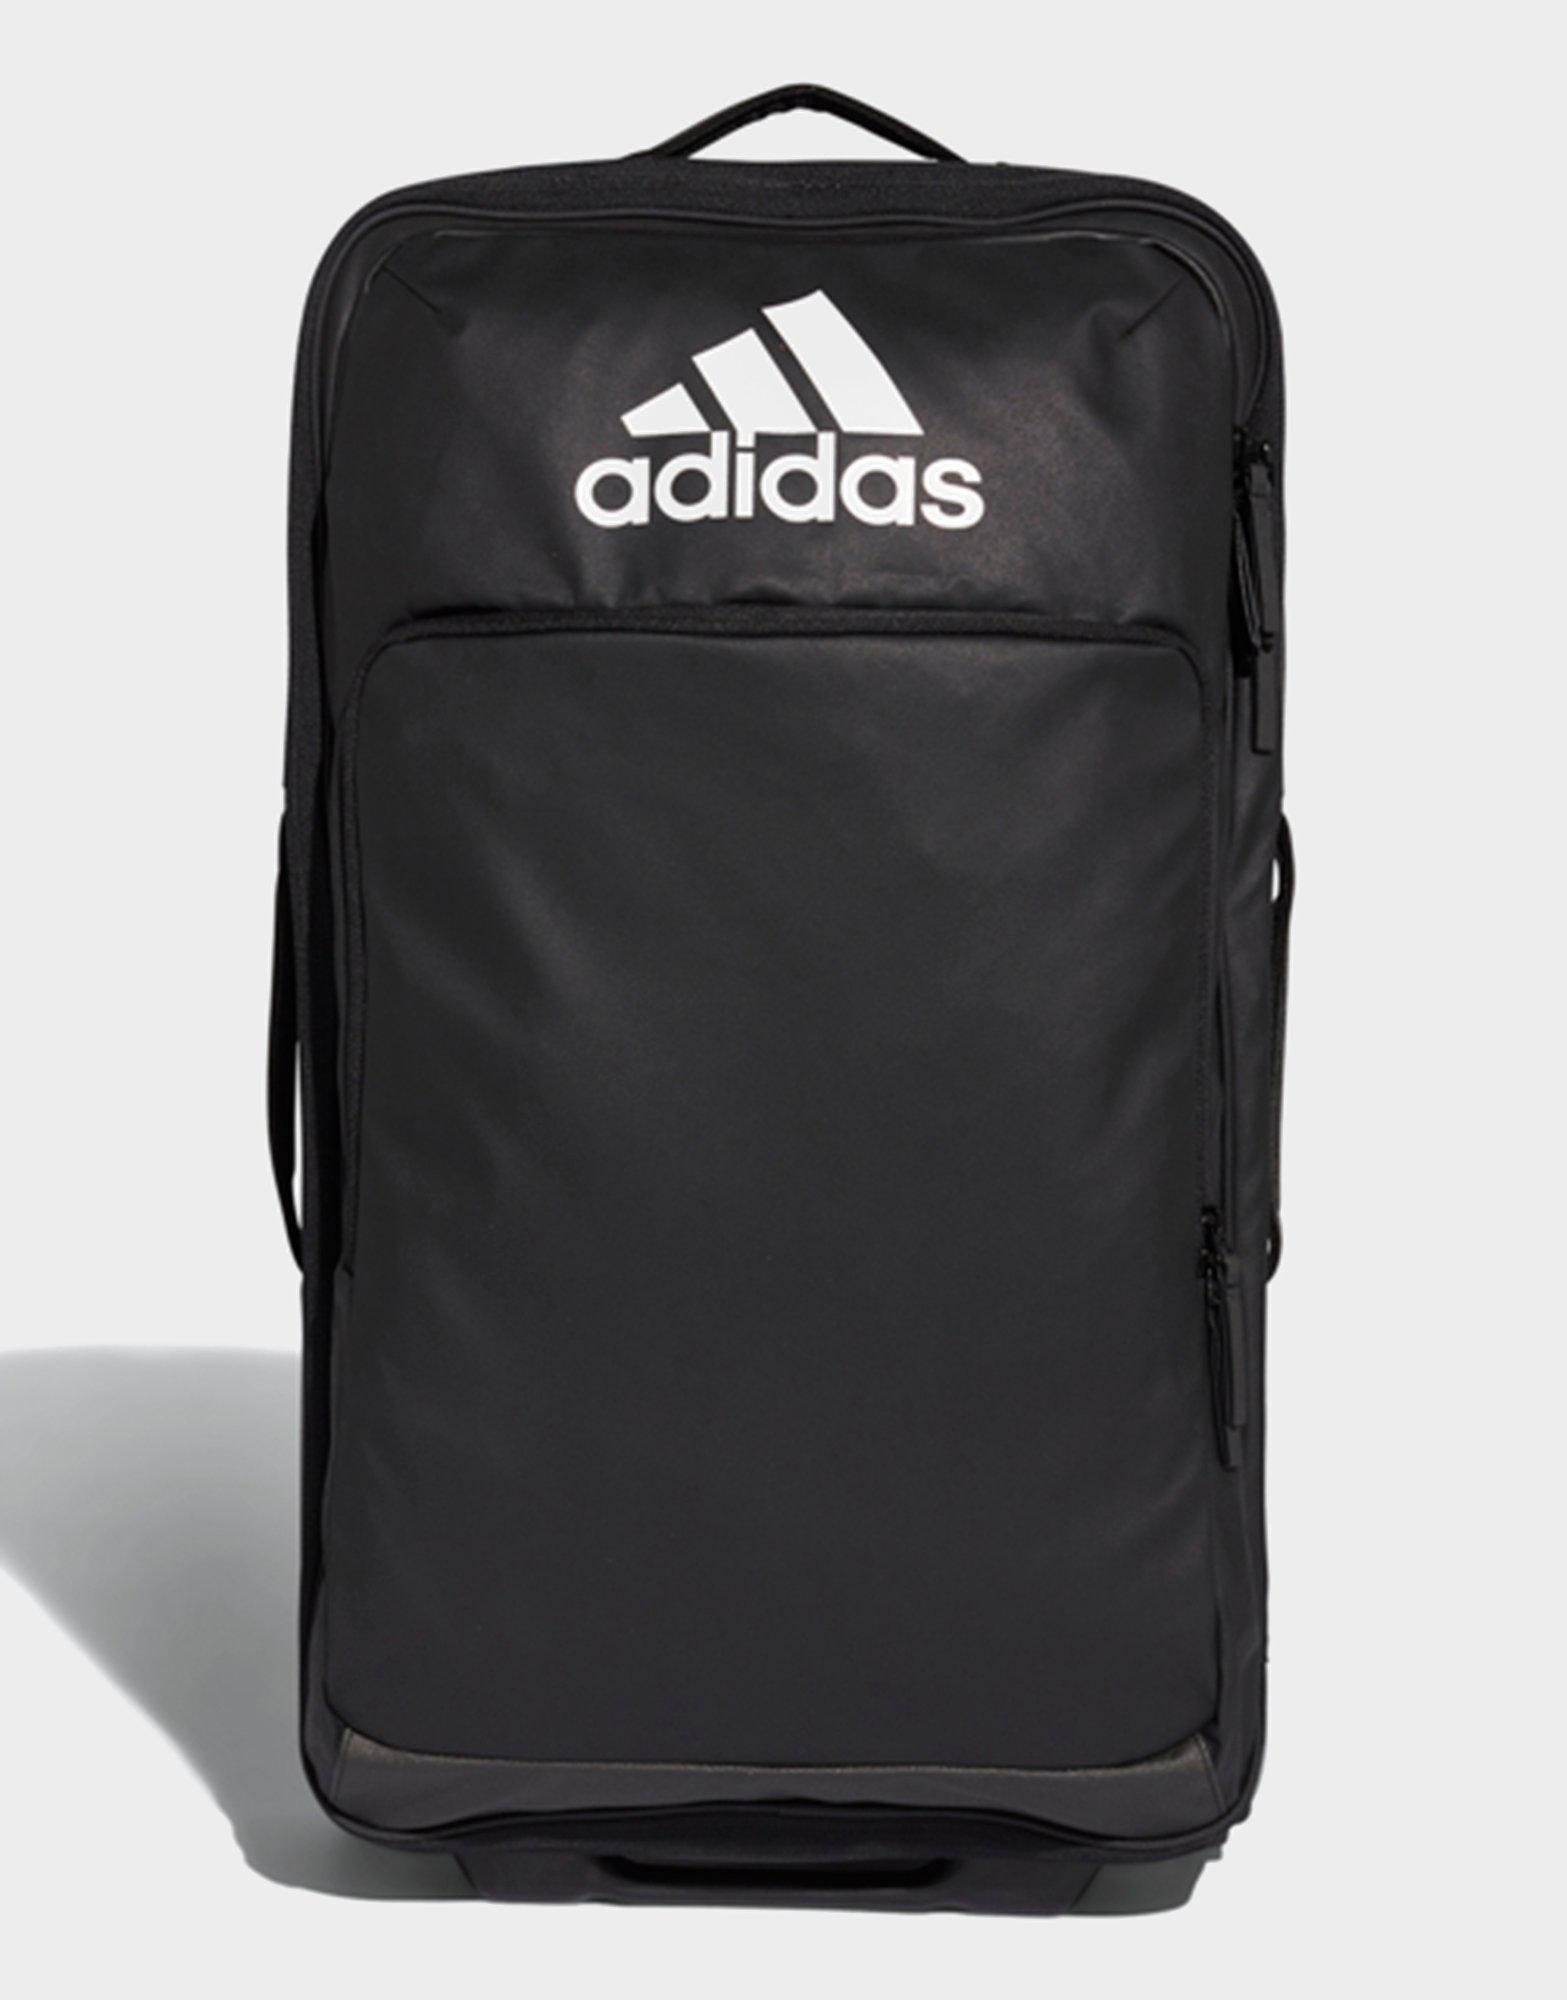 edfe0381350c Adidas - Black Trolley Bag Medium for Men - Lyst. View fullscreen